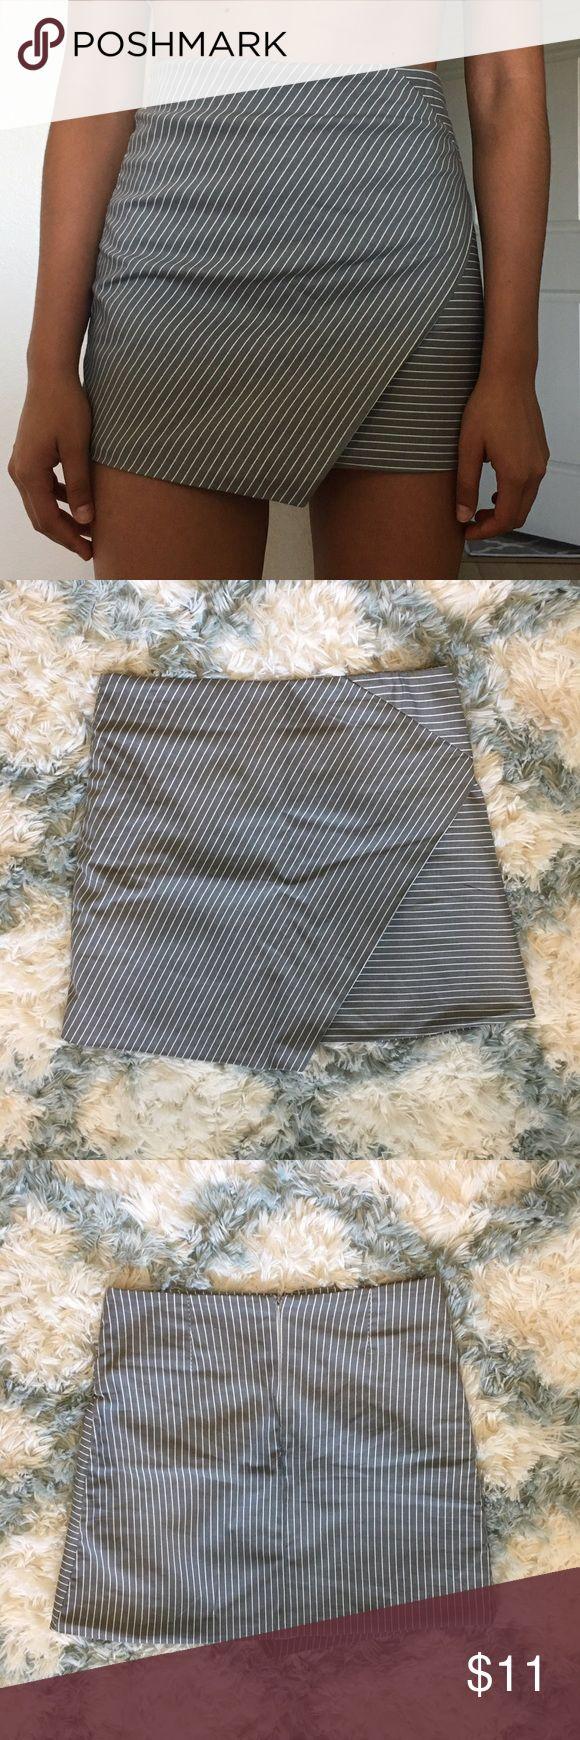 Best 20+ Origami skirt ideas on Pinterest - photo#41